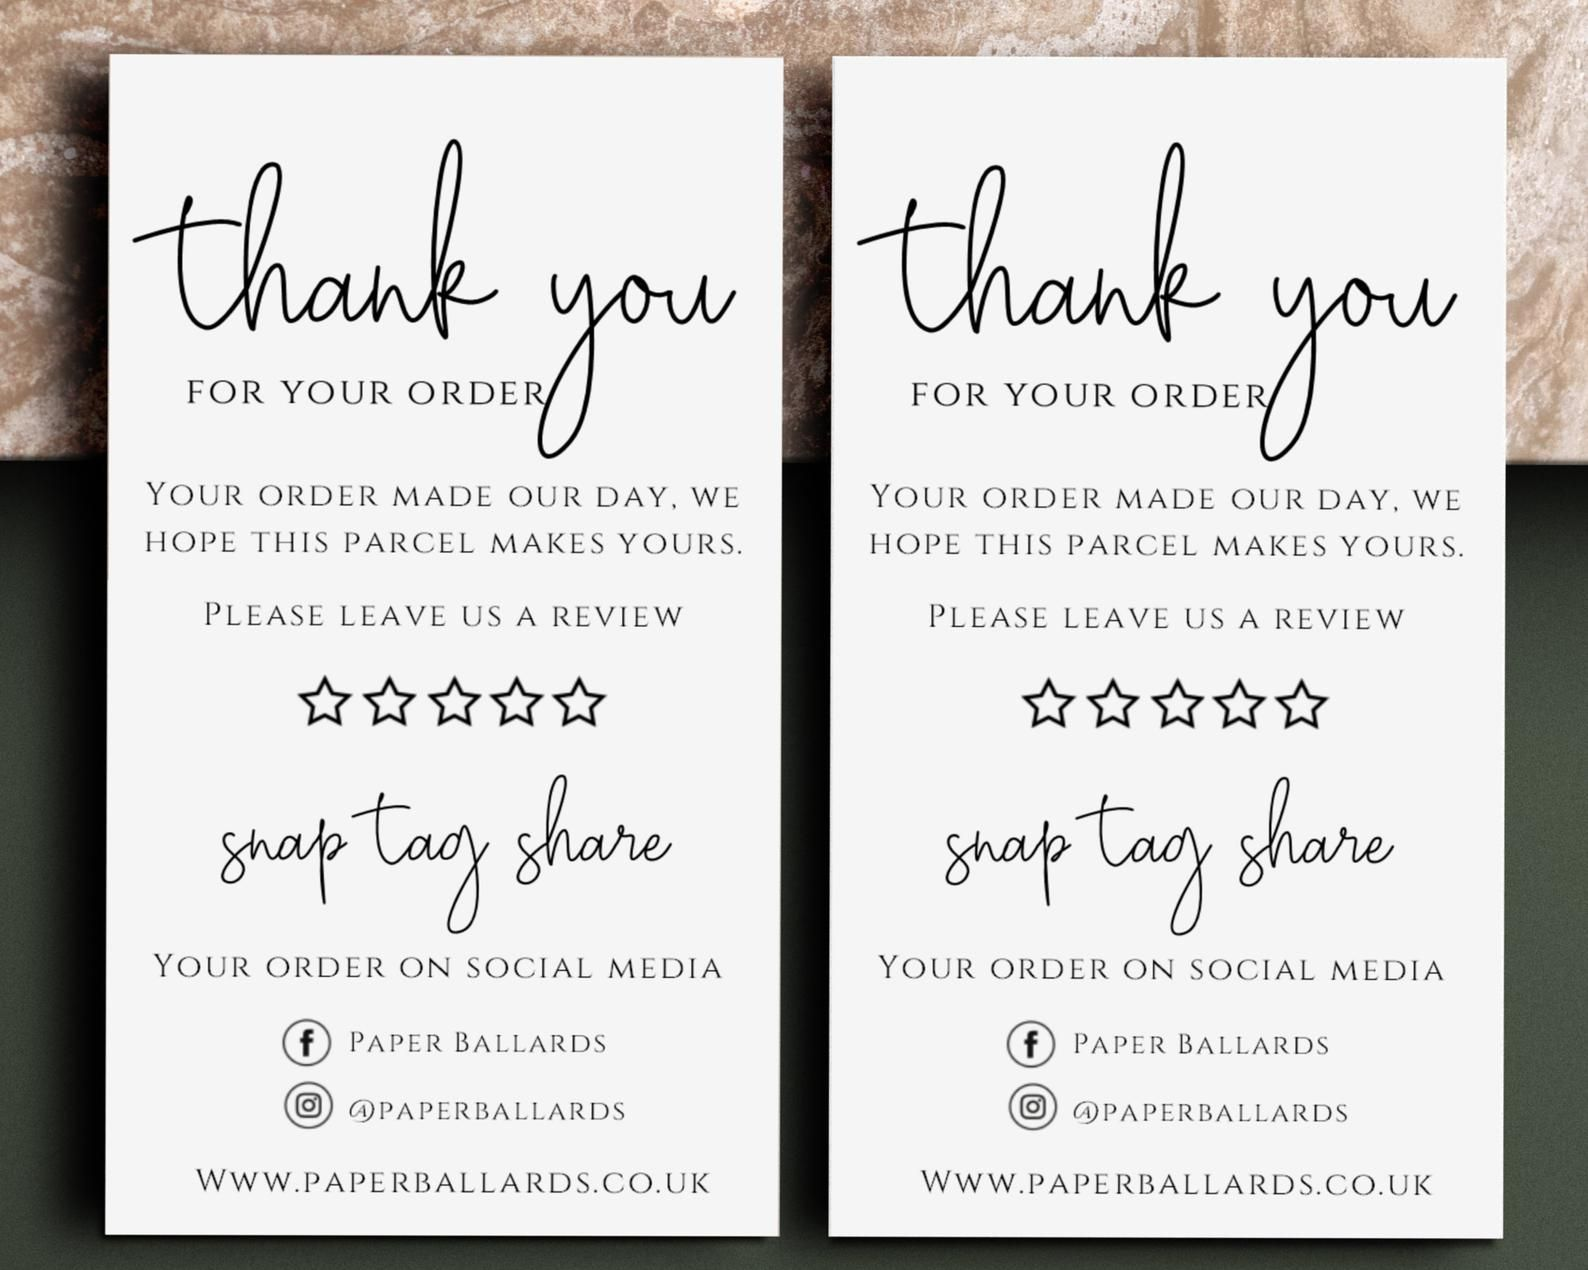 Thank You For Your Order Cards Please Leave A Review Card Etsy Kartu Nama Bisnis Kartu Nama Ide Kemasan